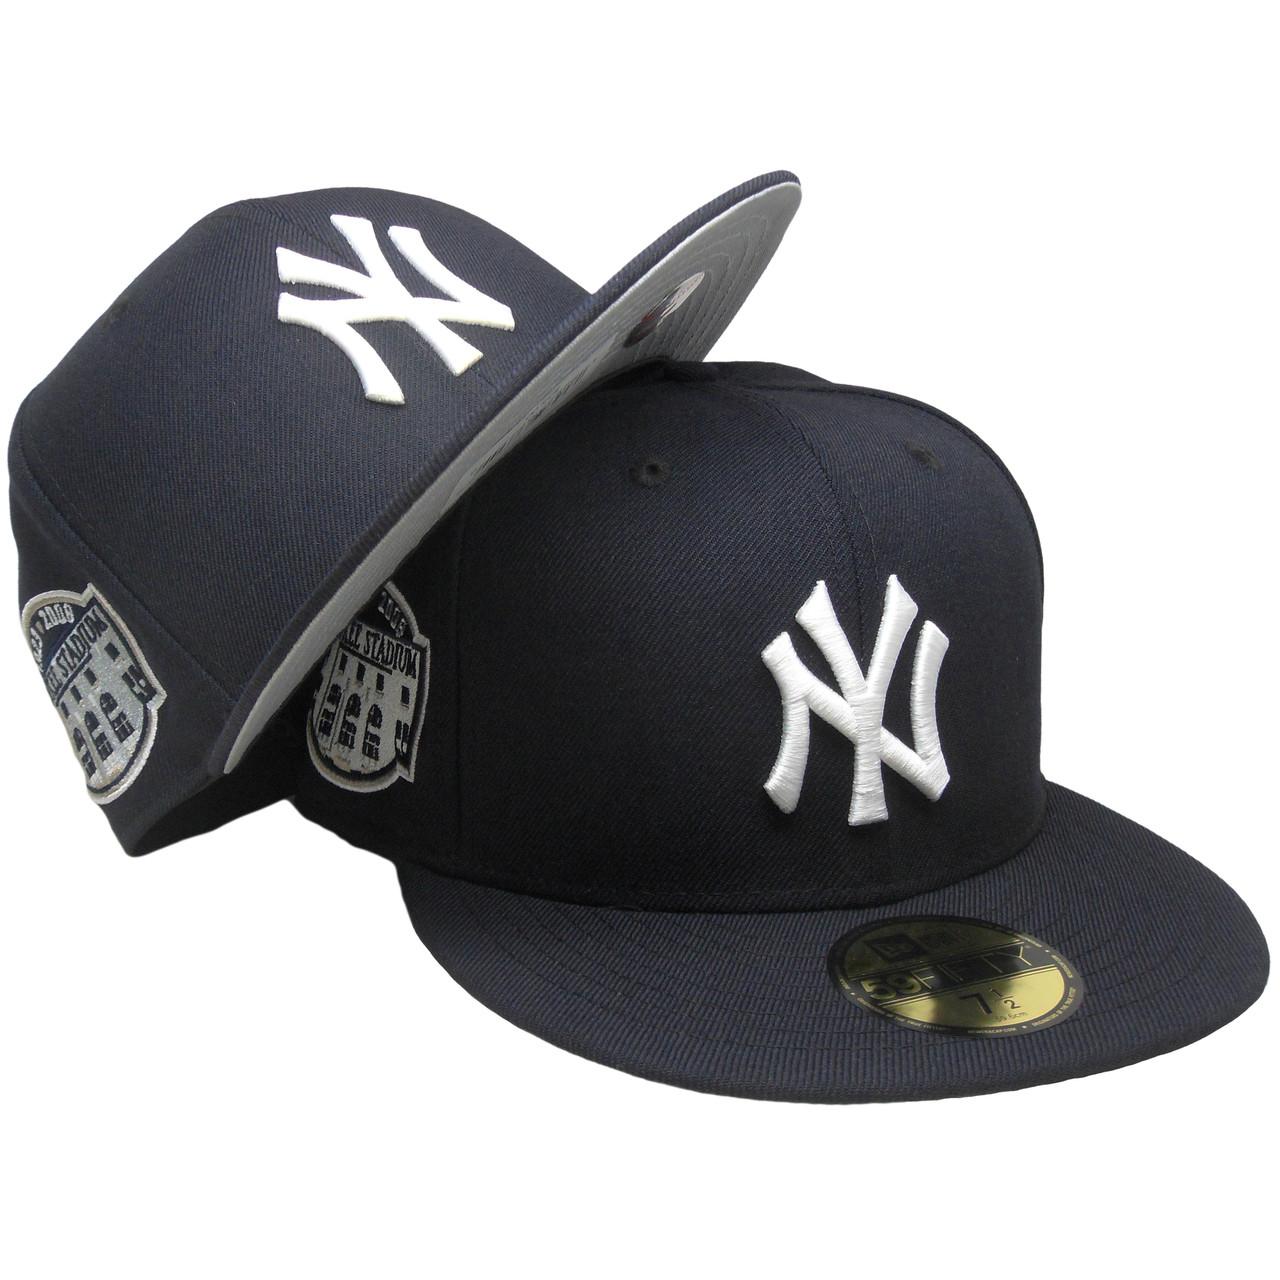 b42ecee4df011d New York Yankees New Era Custom Stadium Patch Fitted - Navy, White, Gray